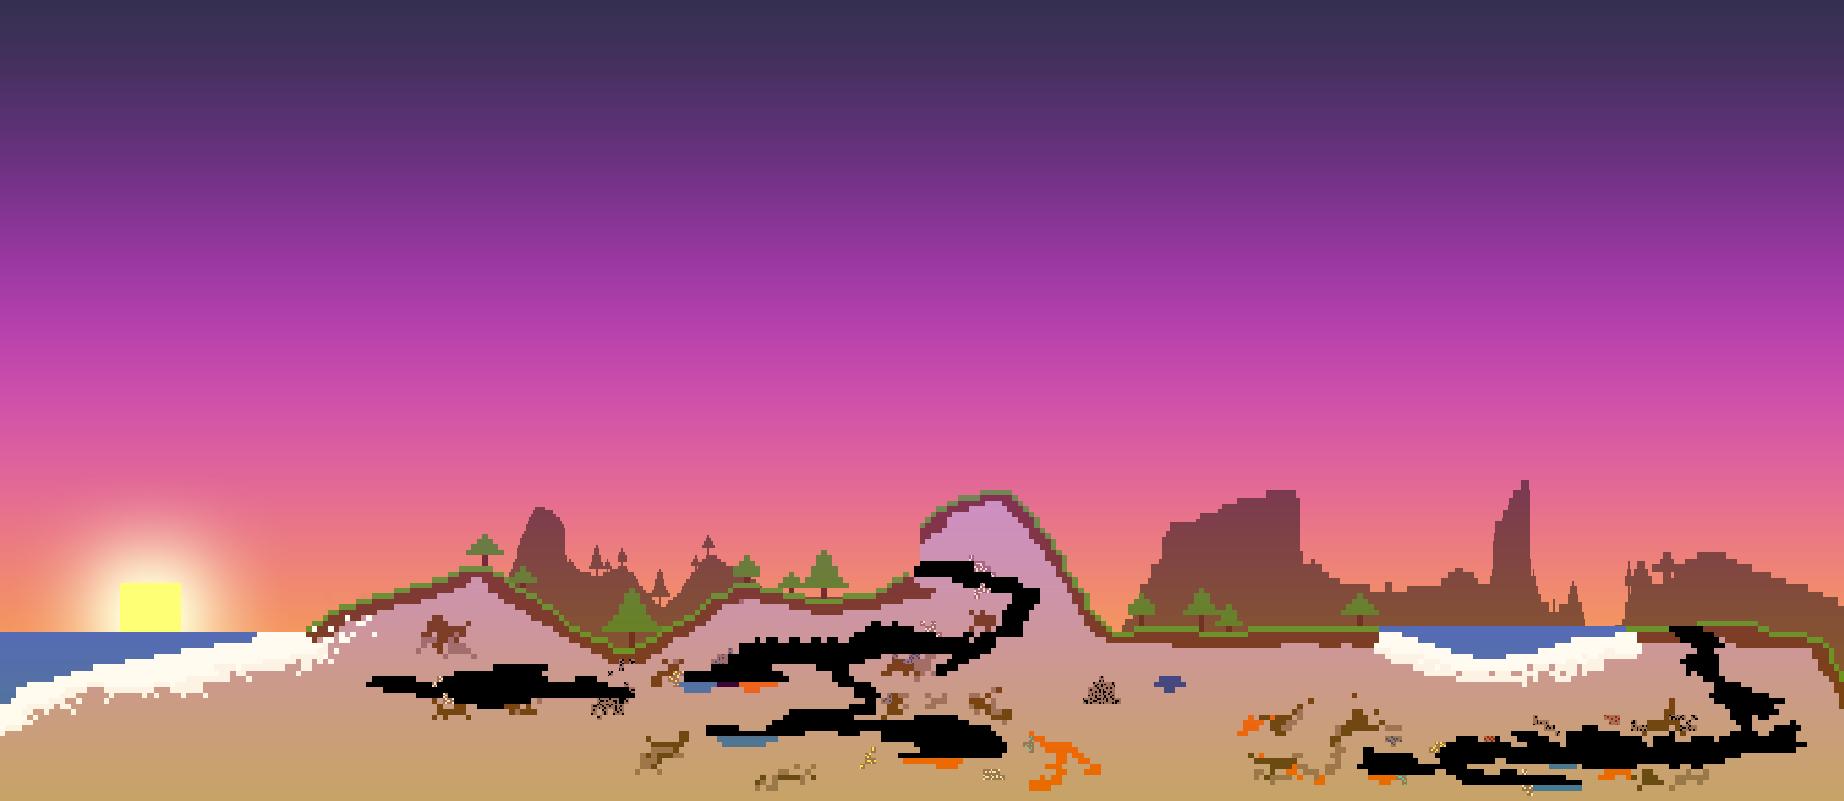 Pixel Art Landscape Wallpaper